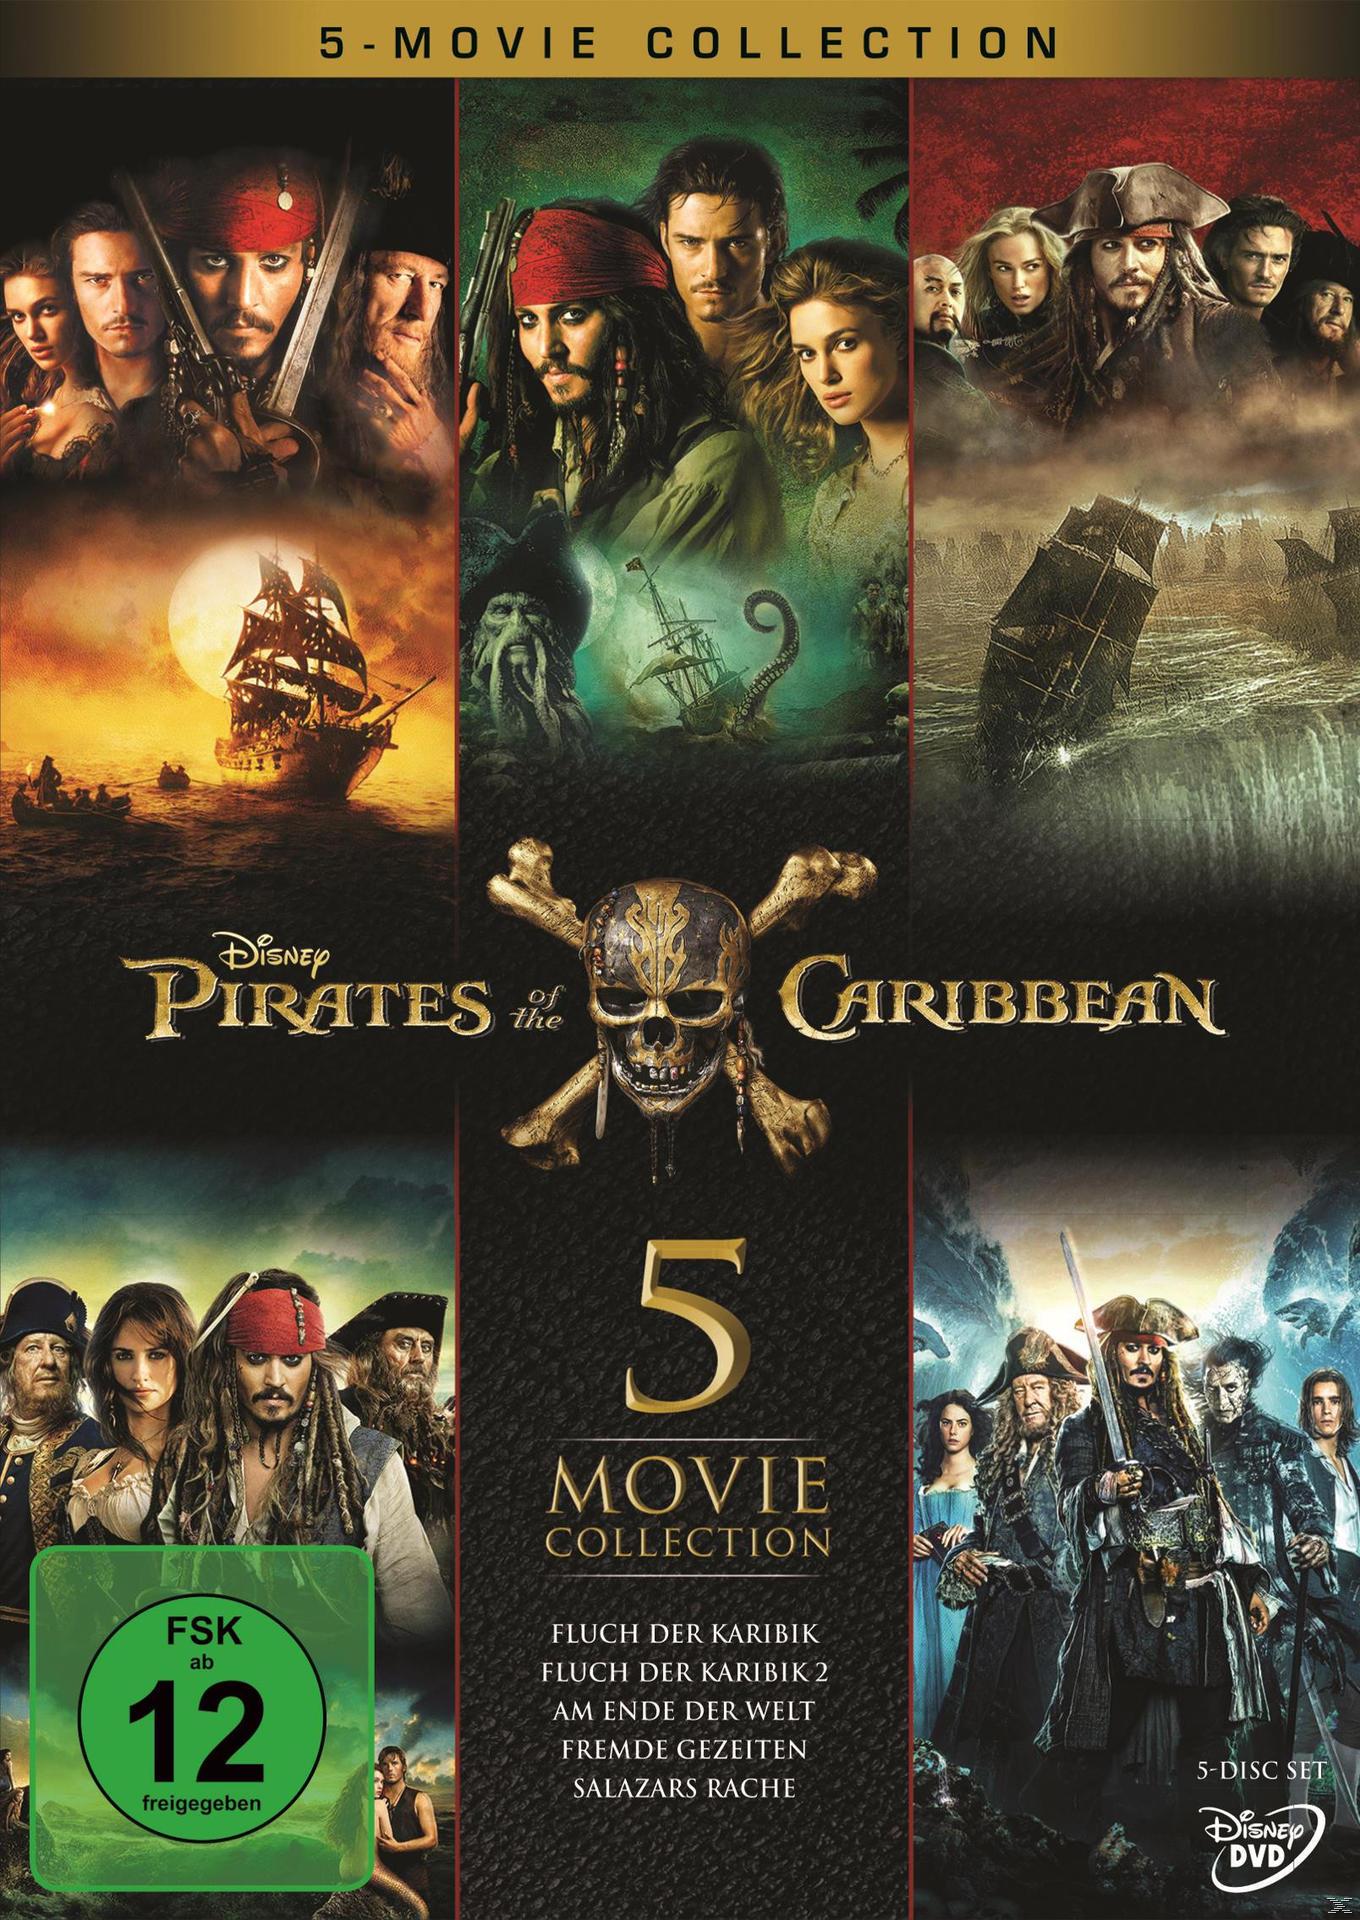 Pirates of the Caribbean 1 - 5 DVD-Box (DVD) für 29,99 Euro